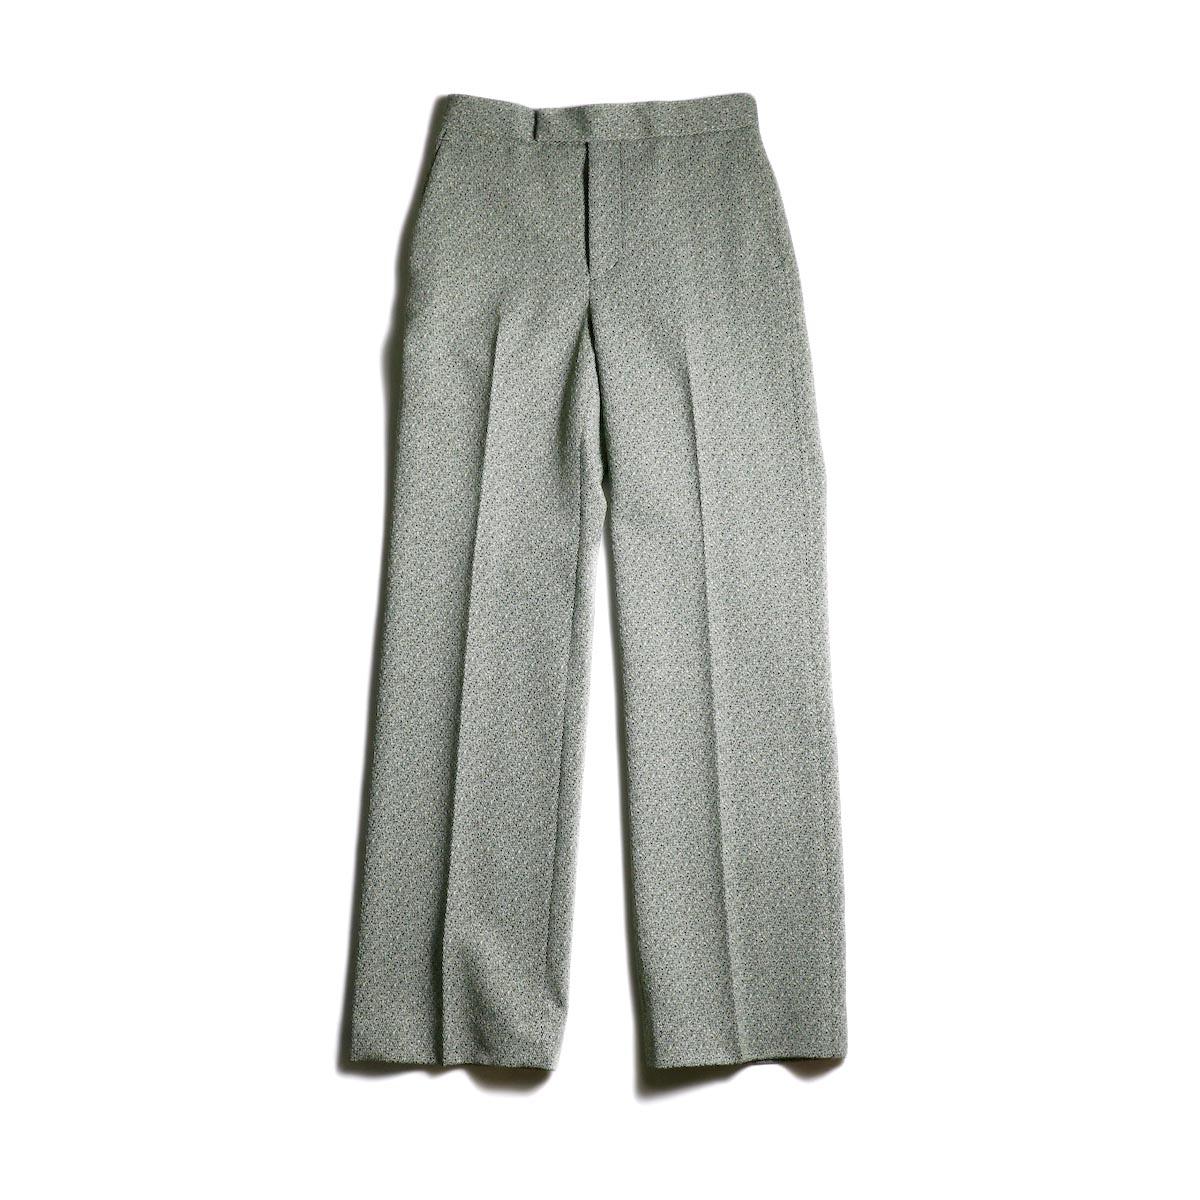 FUMIKA UCHIDA / Poli Tweed Straight Slacks -Green 正面